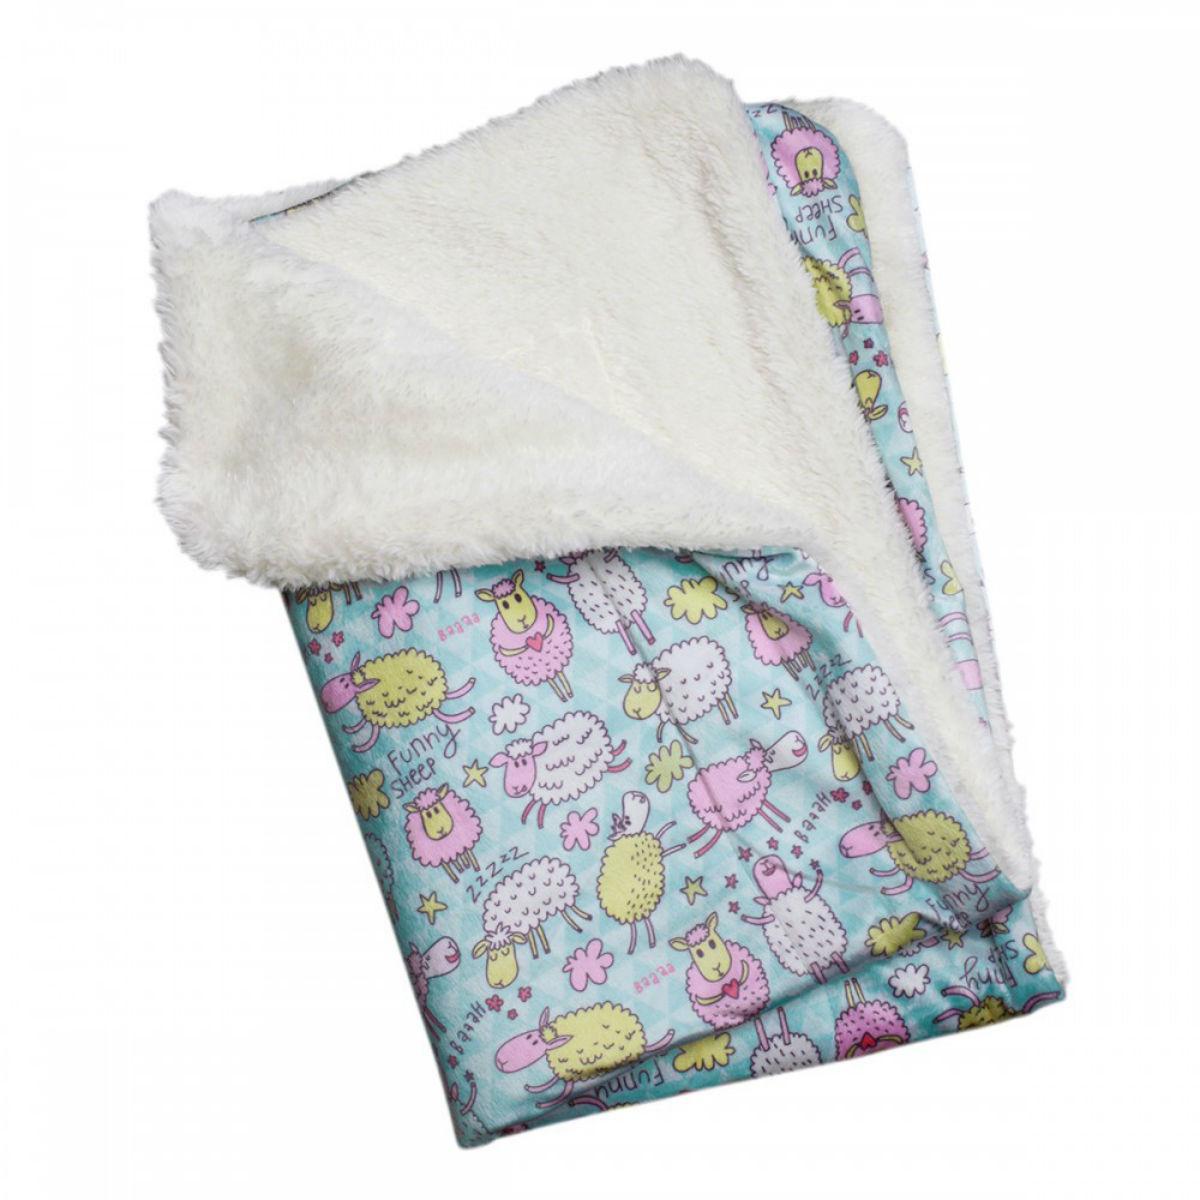 Funny Sheep Ultra-Soft Minky Plush Dog Blanket by Klippo